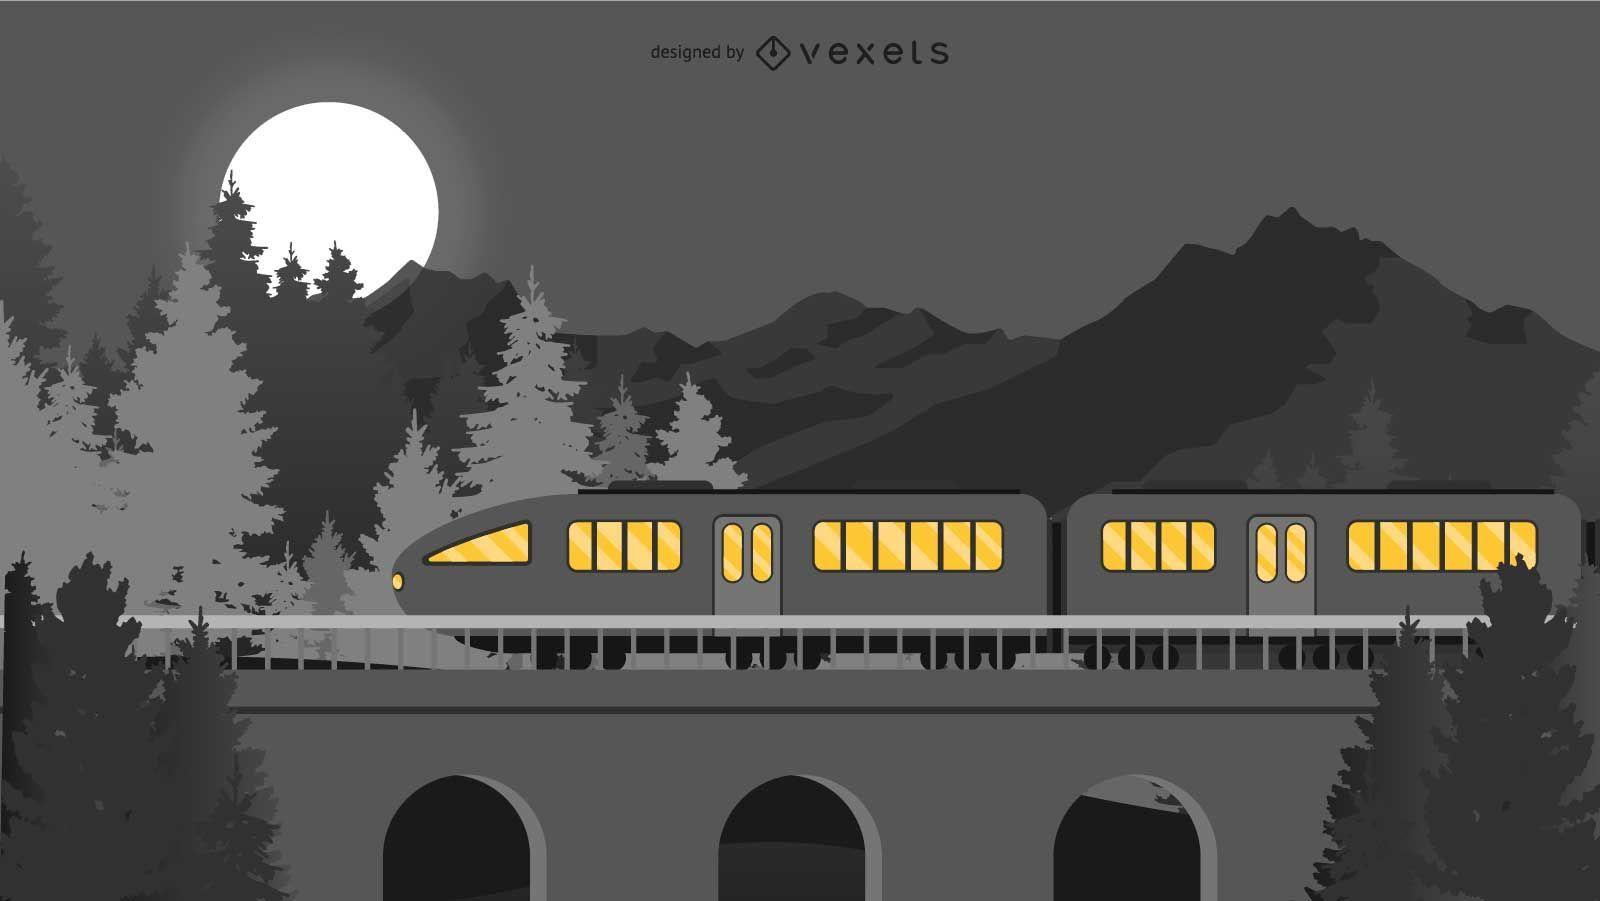 Viajar en tren nocturno Illustation